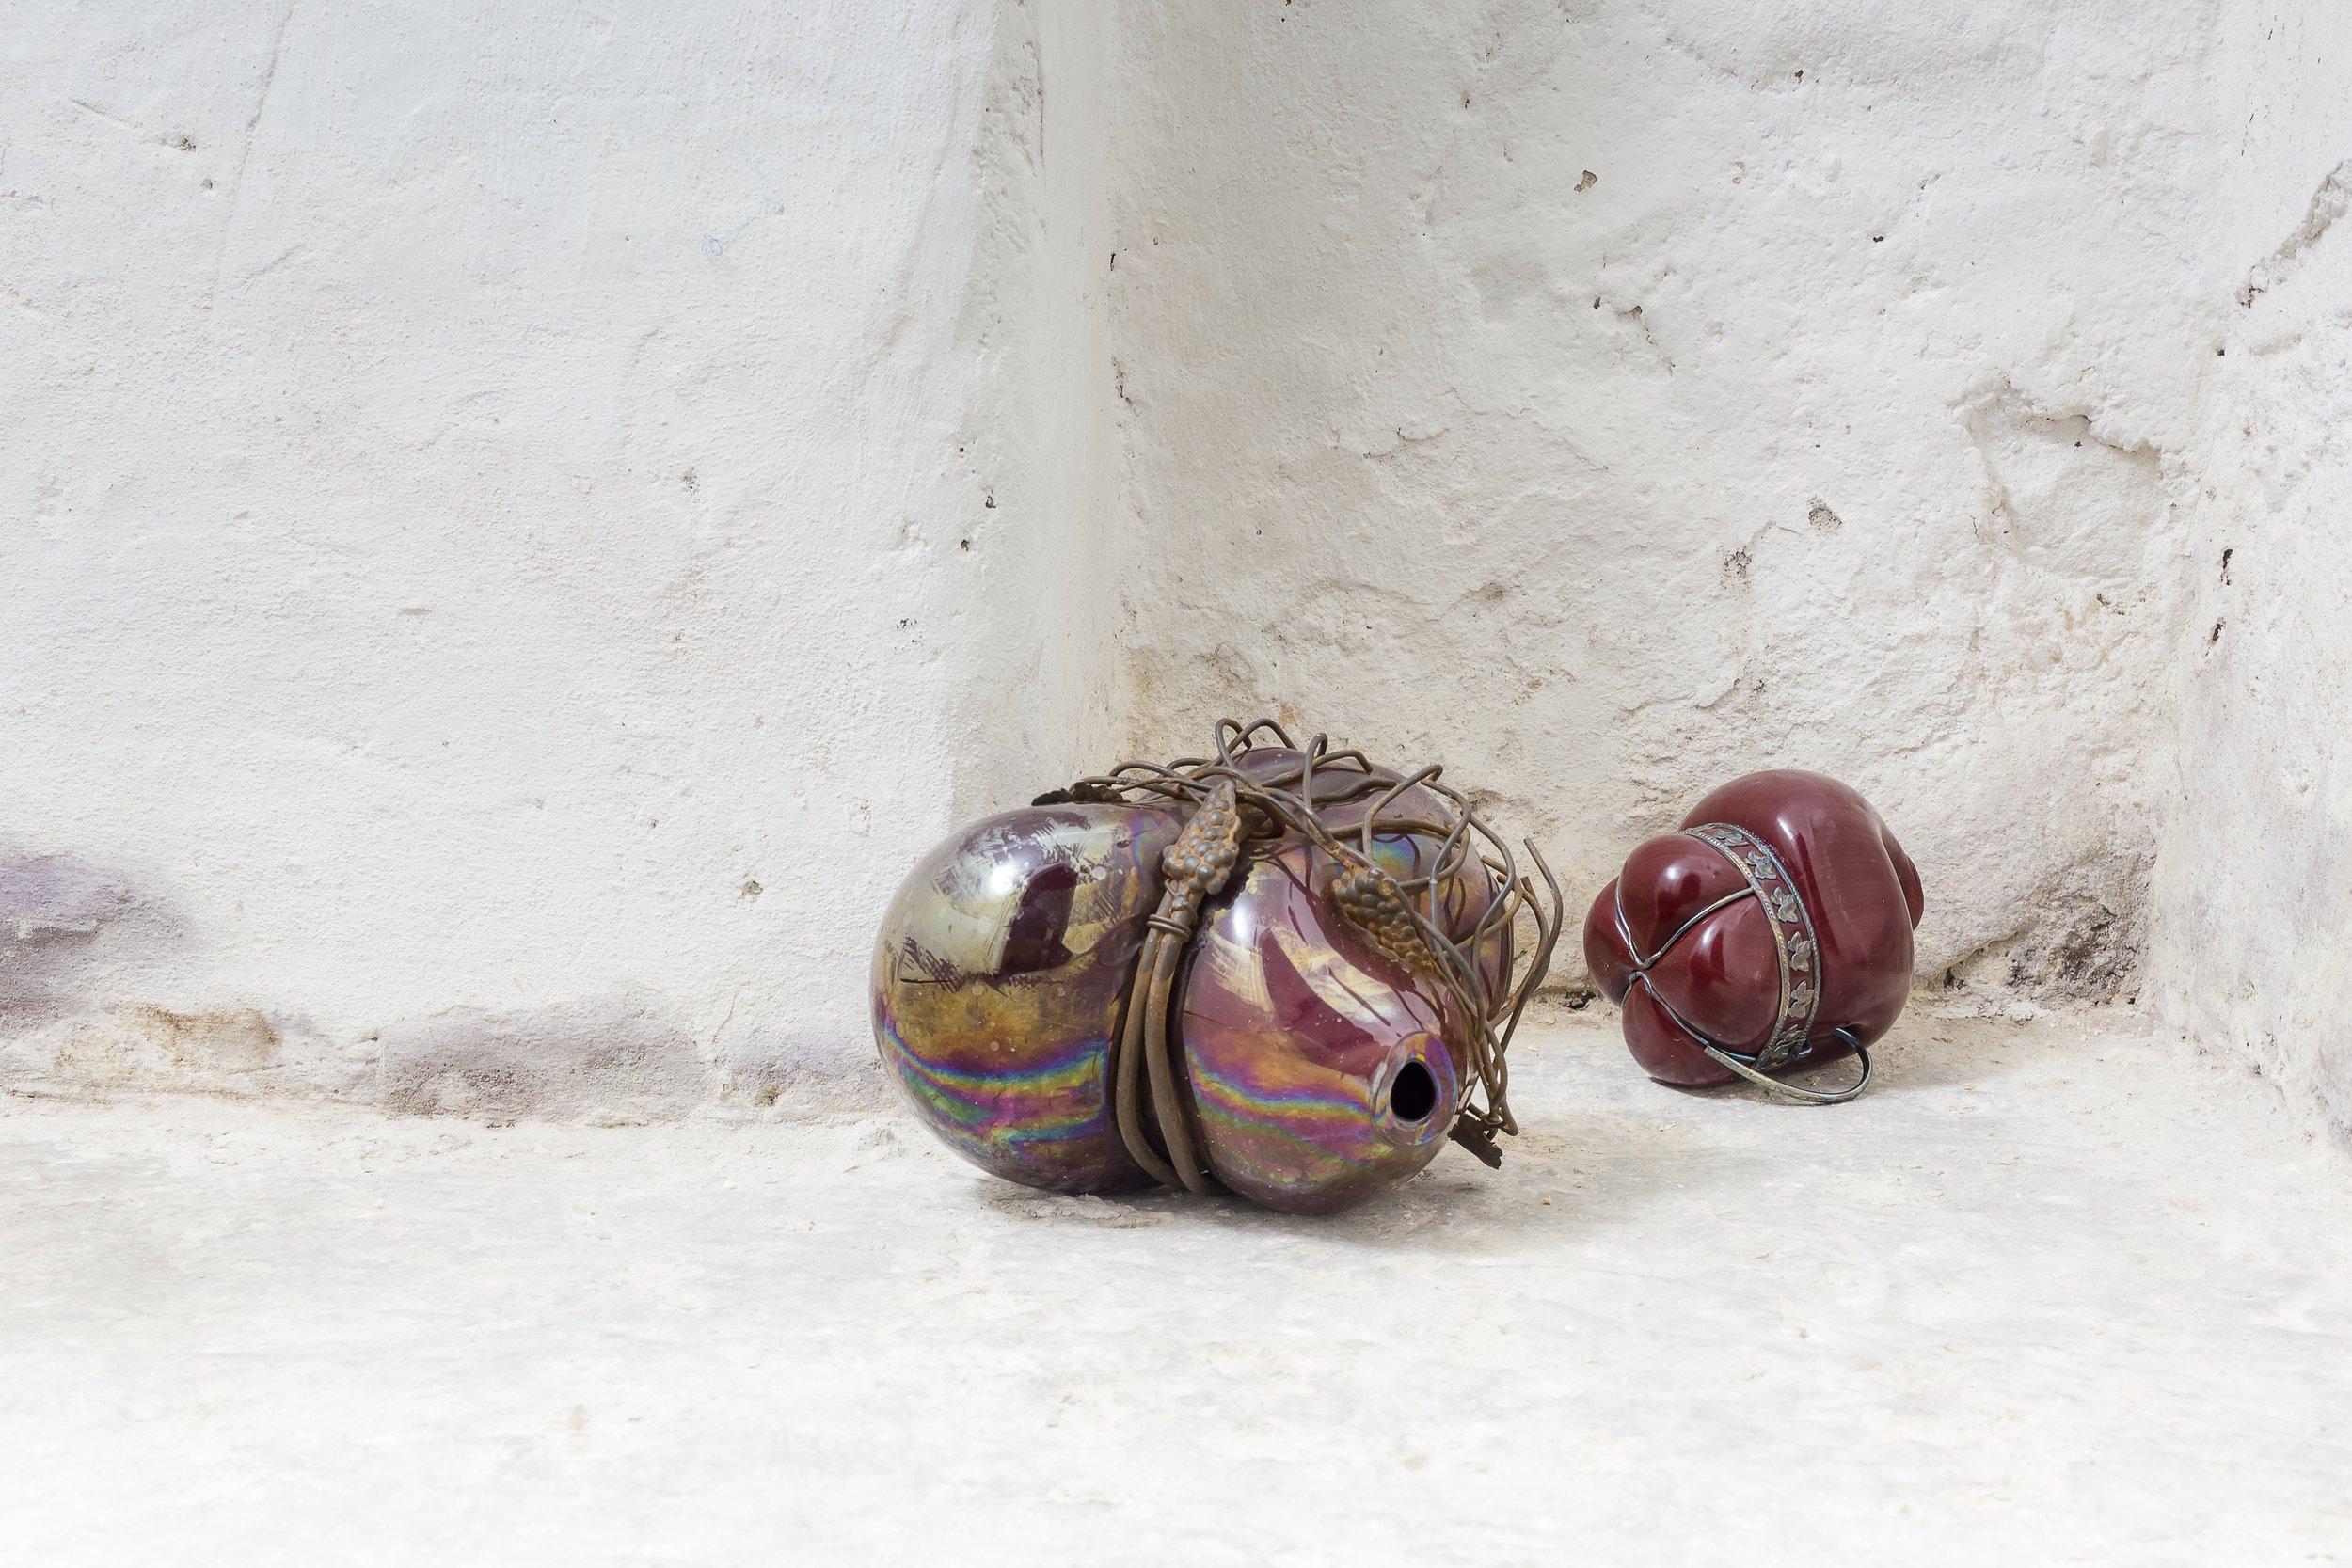 Soffio#2, #3 , 2013, vetro soffiato e metallo, cm 18x17x25/14x13x12